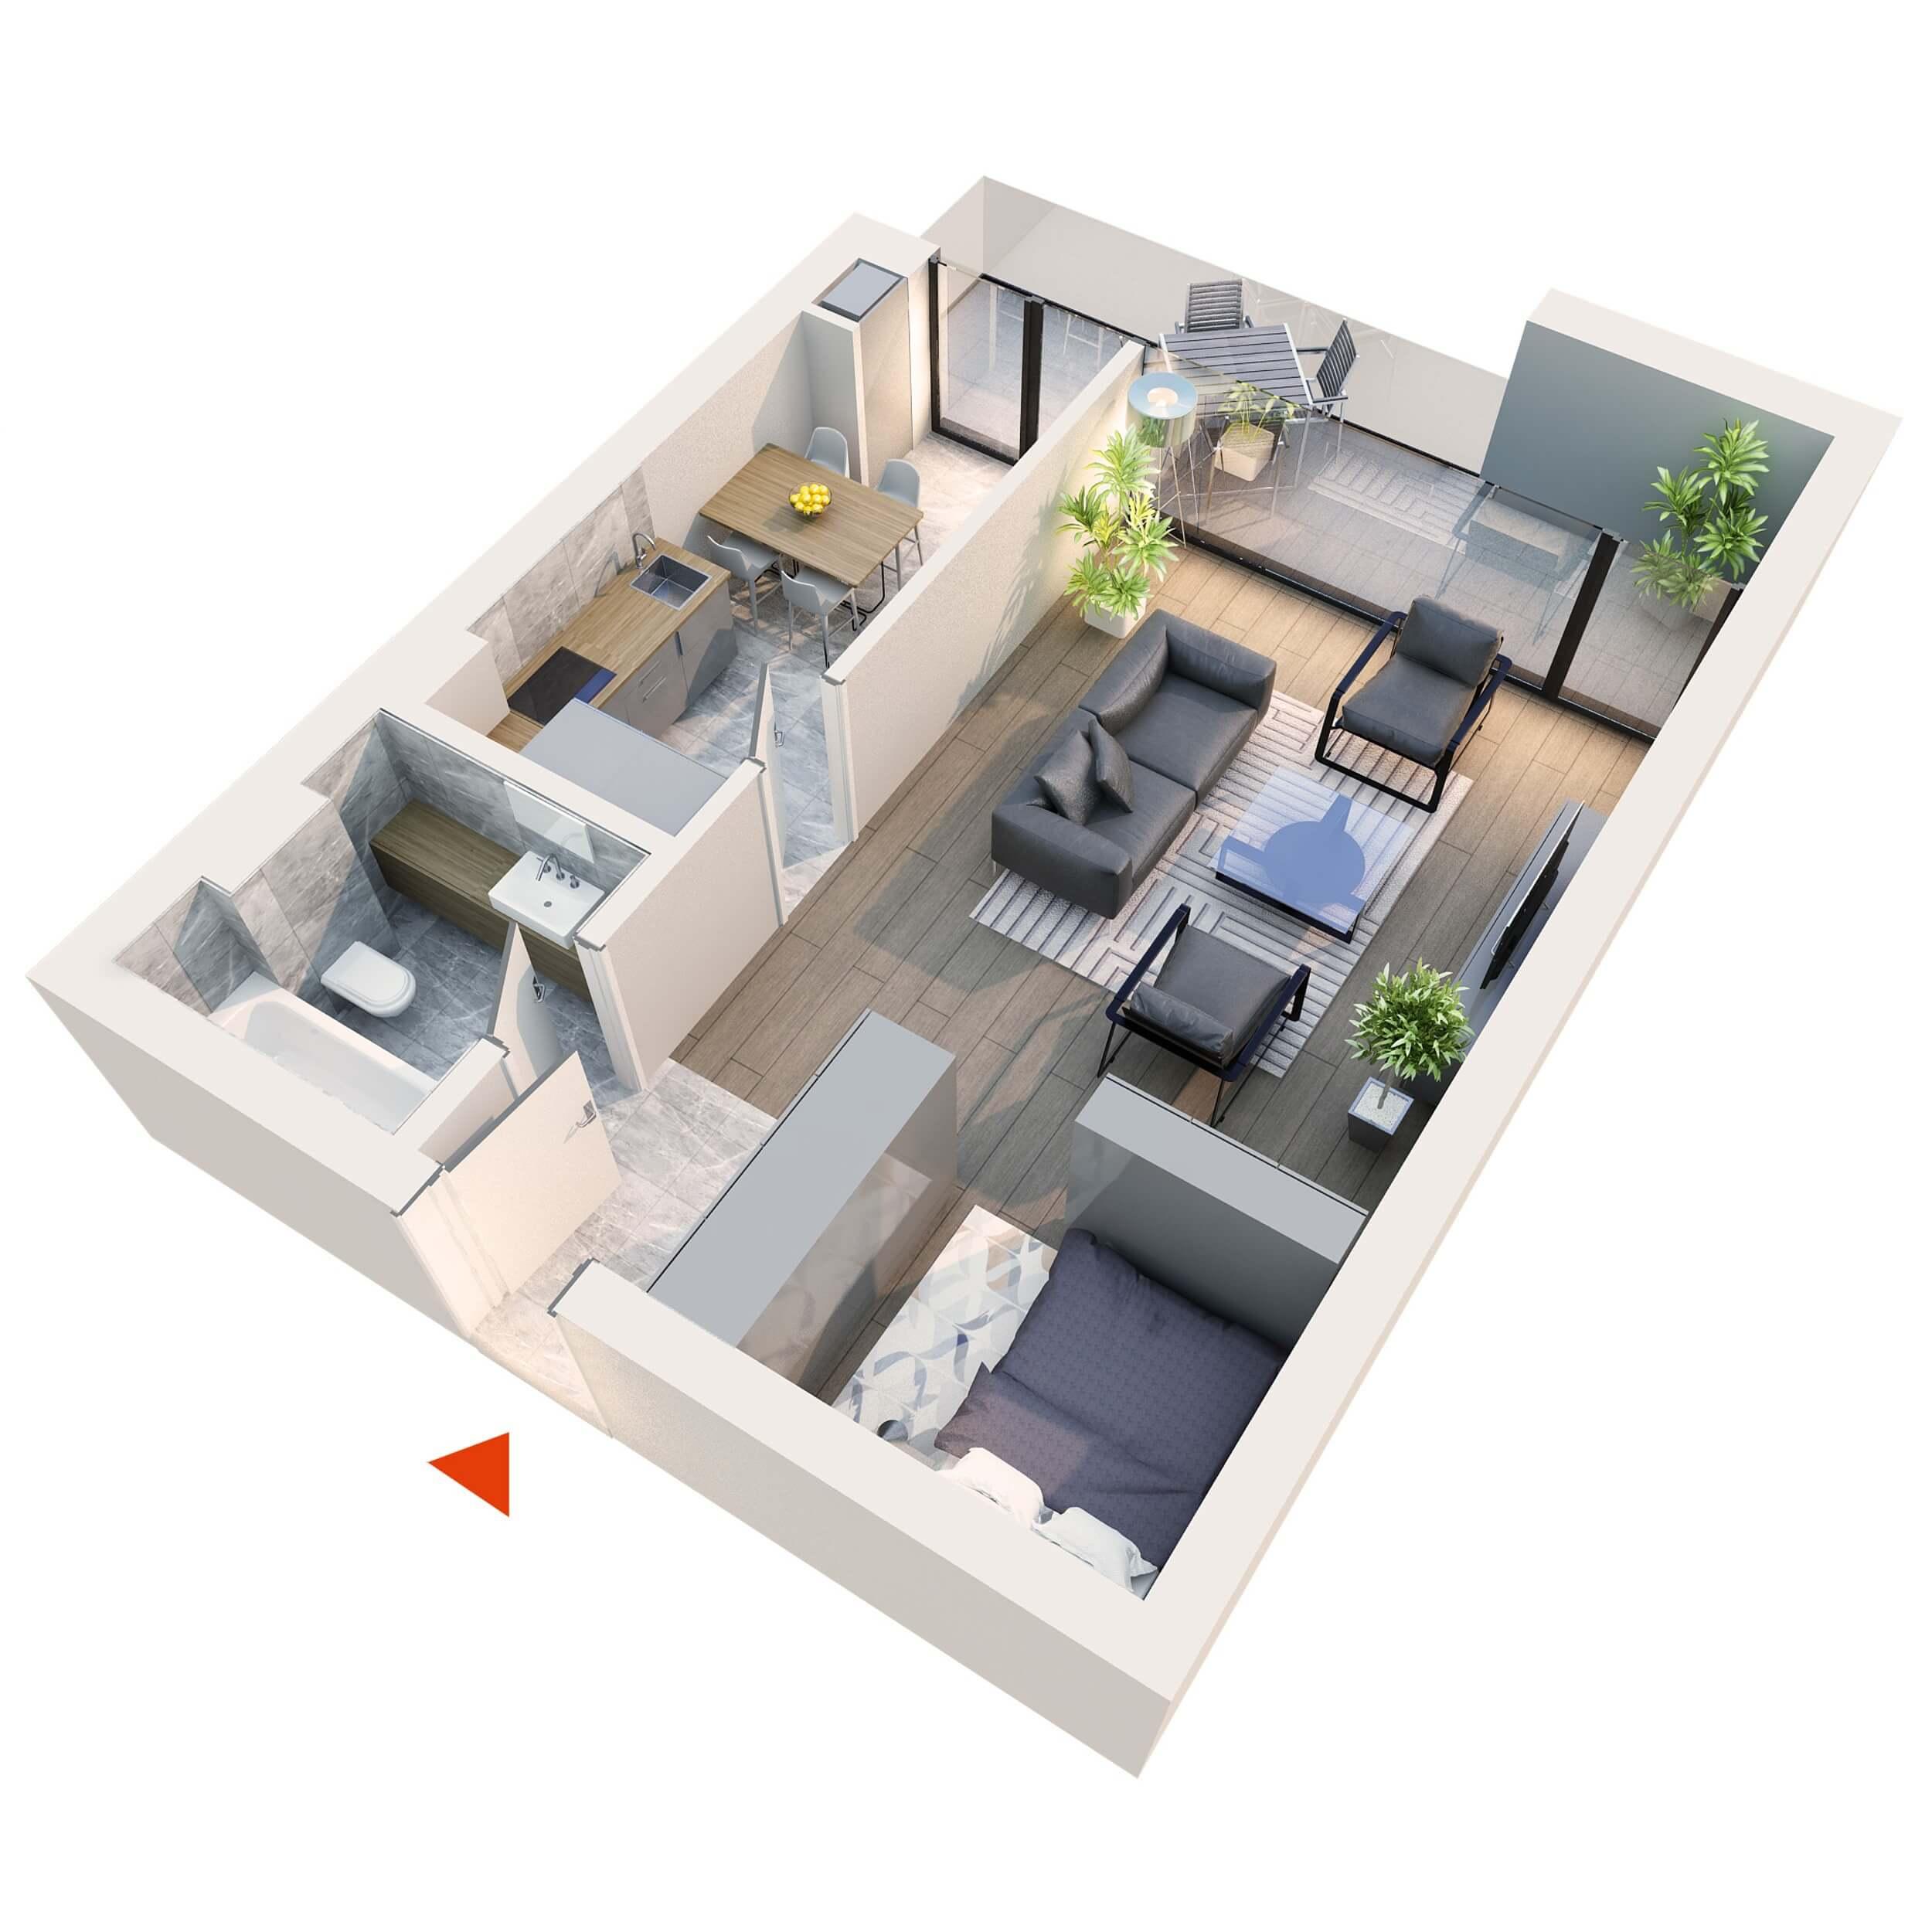 Apartament Studio tip 1F1 | Balcon | Etaj 1 – 5 | Corp C7 C8 | Faza 2